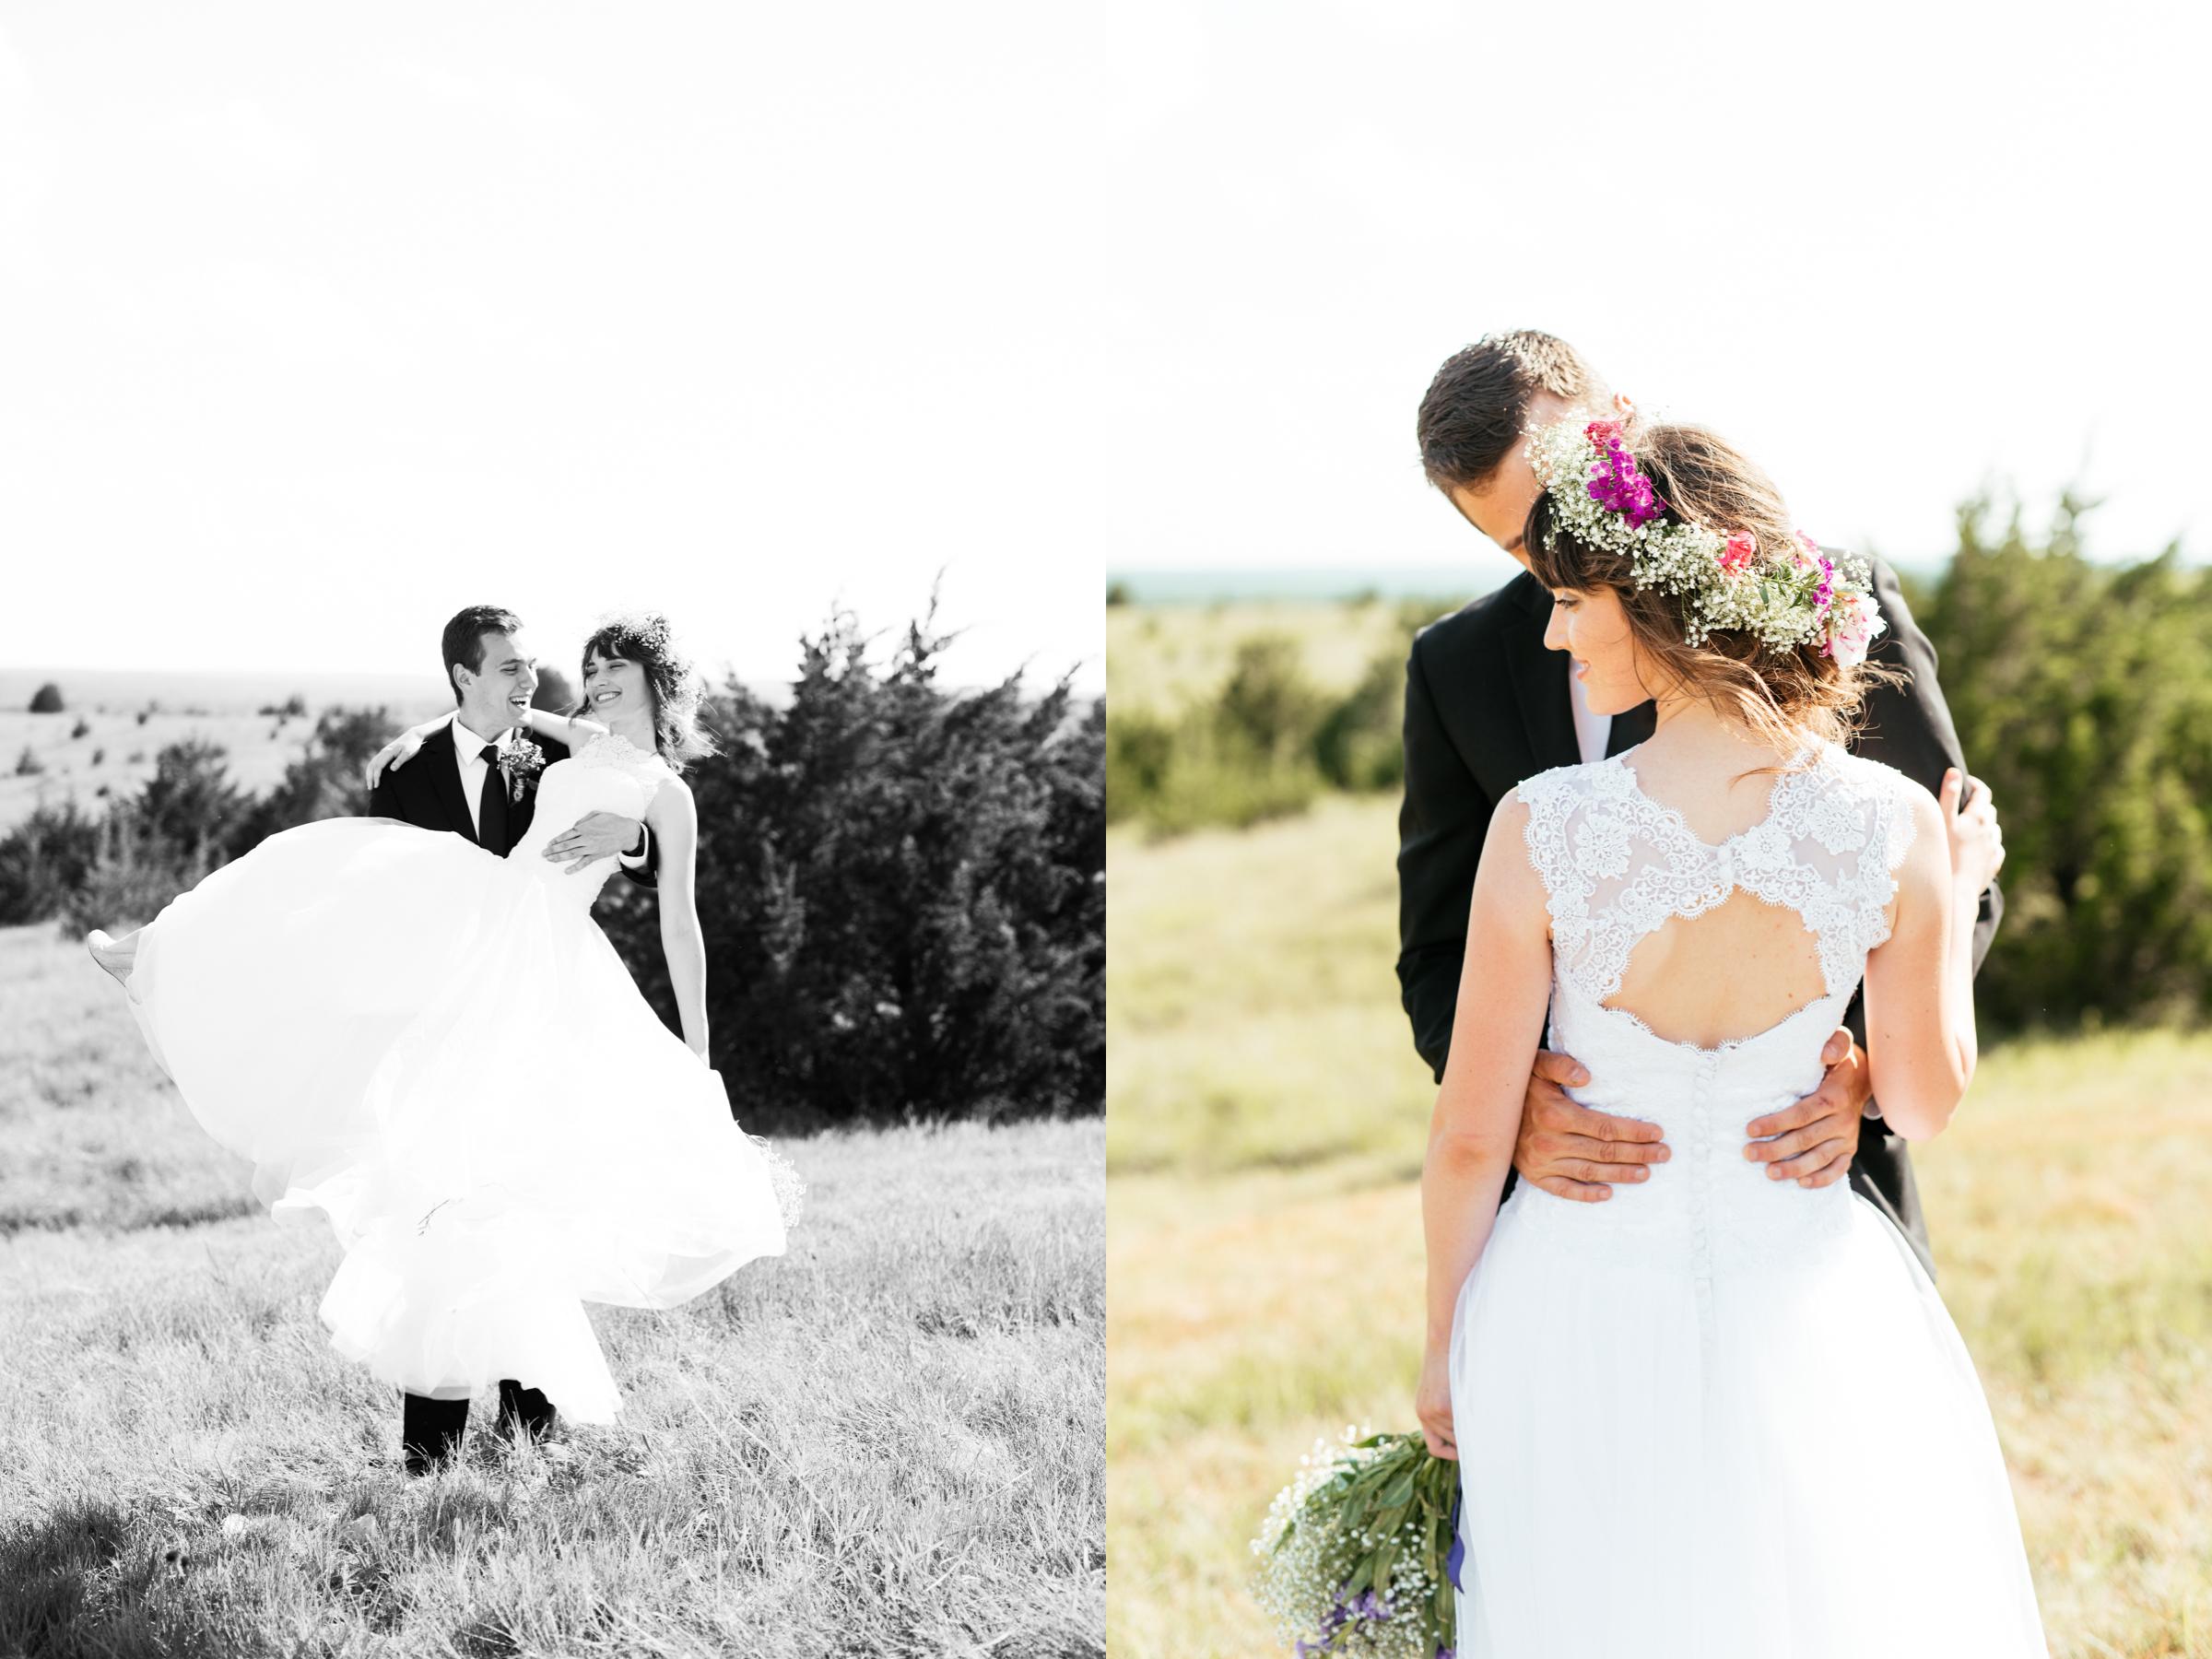 McCurrach Wedding6.jpg